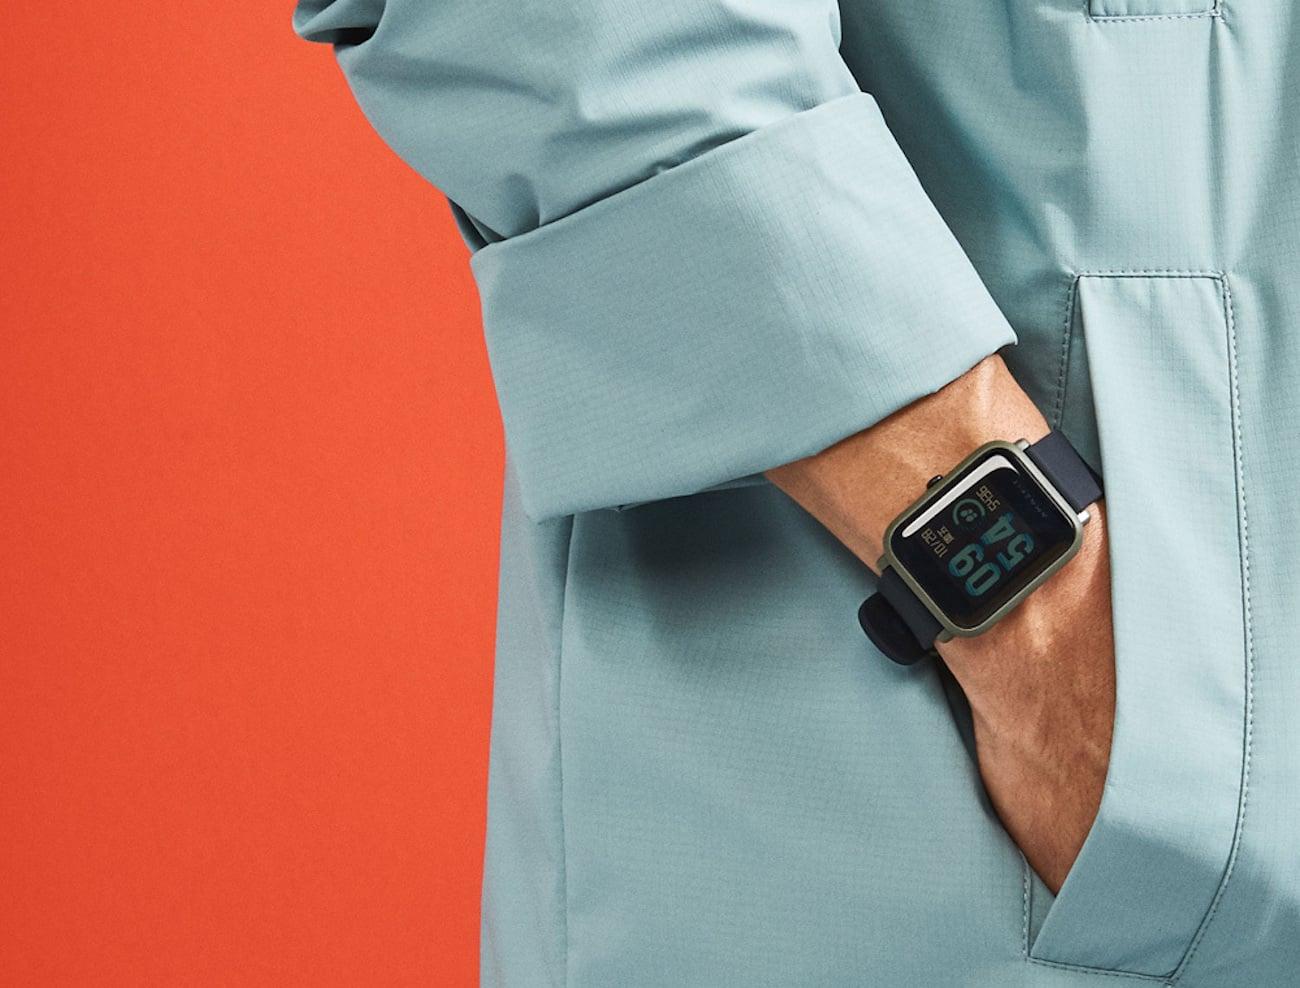 Xiaomi Amazfit Bip Sports Smartwatch 187 Gadget Flow